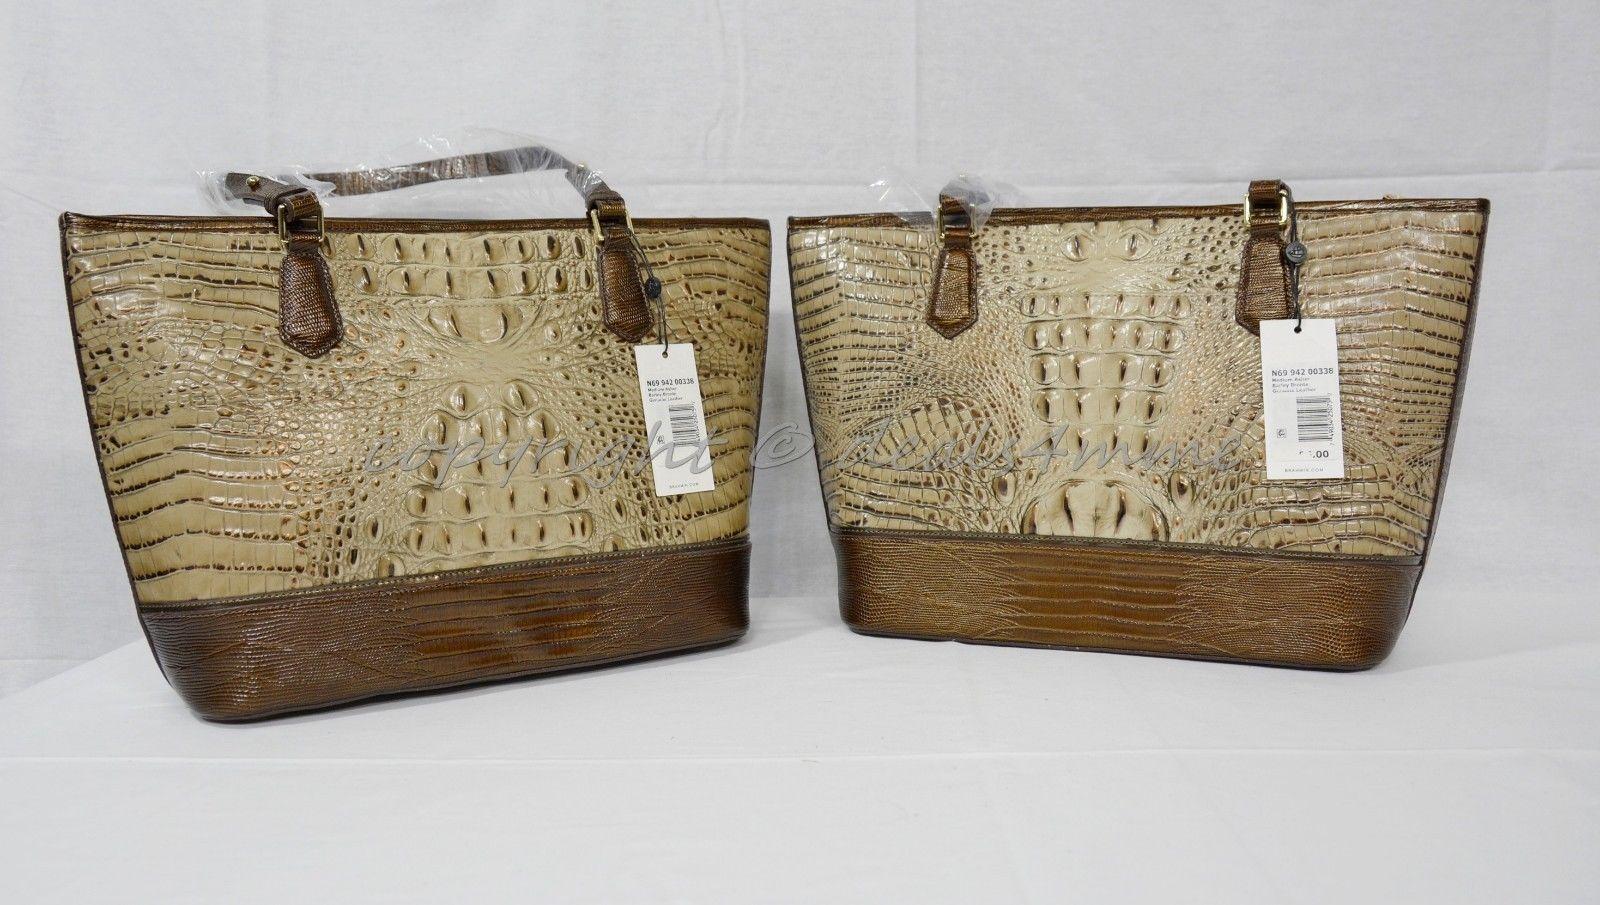 NWT Brahmin Medium Asher Leather Tote/Shoulder Bag Barley Bronte - Beige Brown image 12